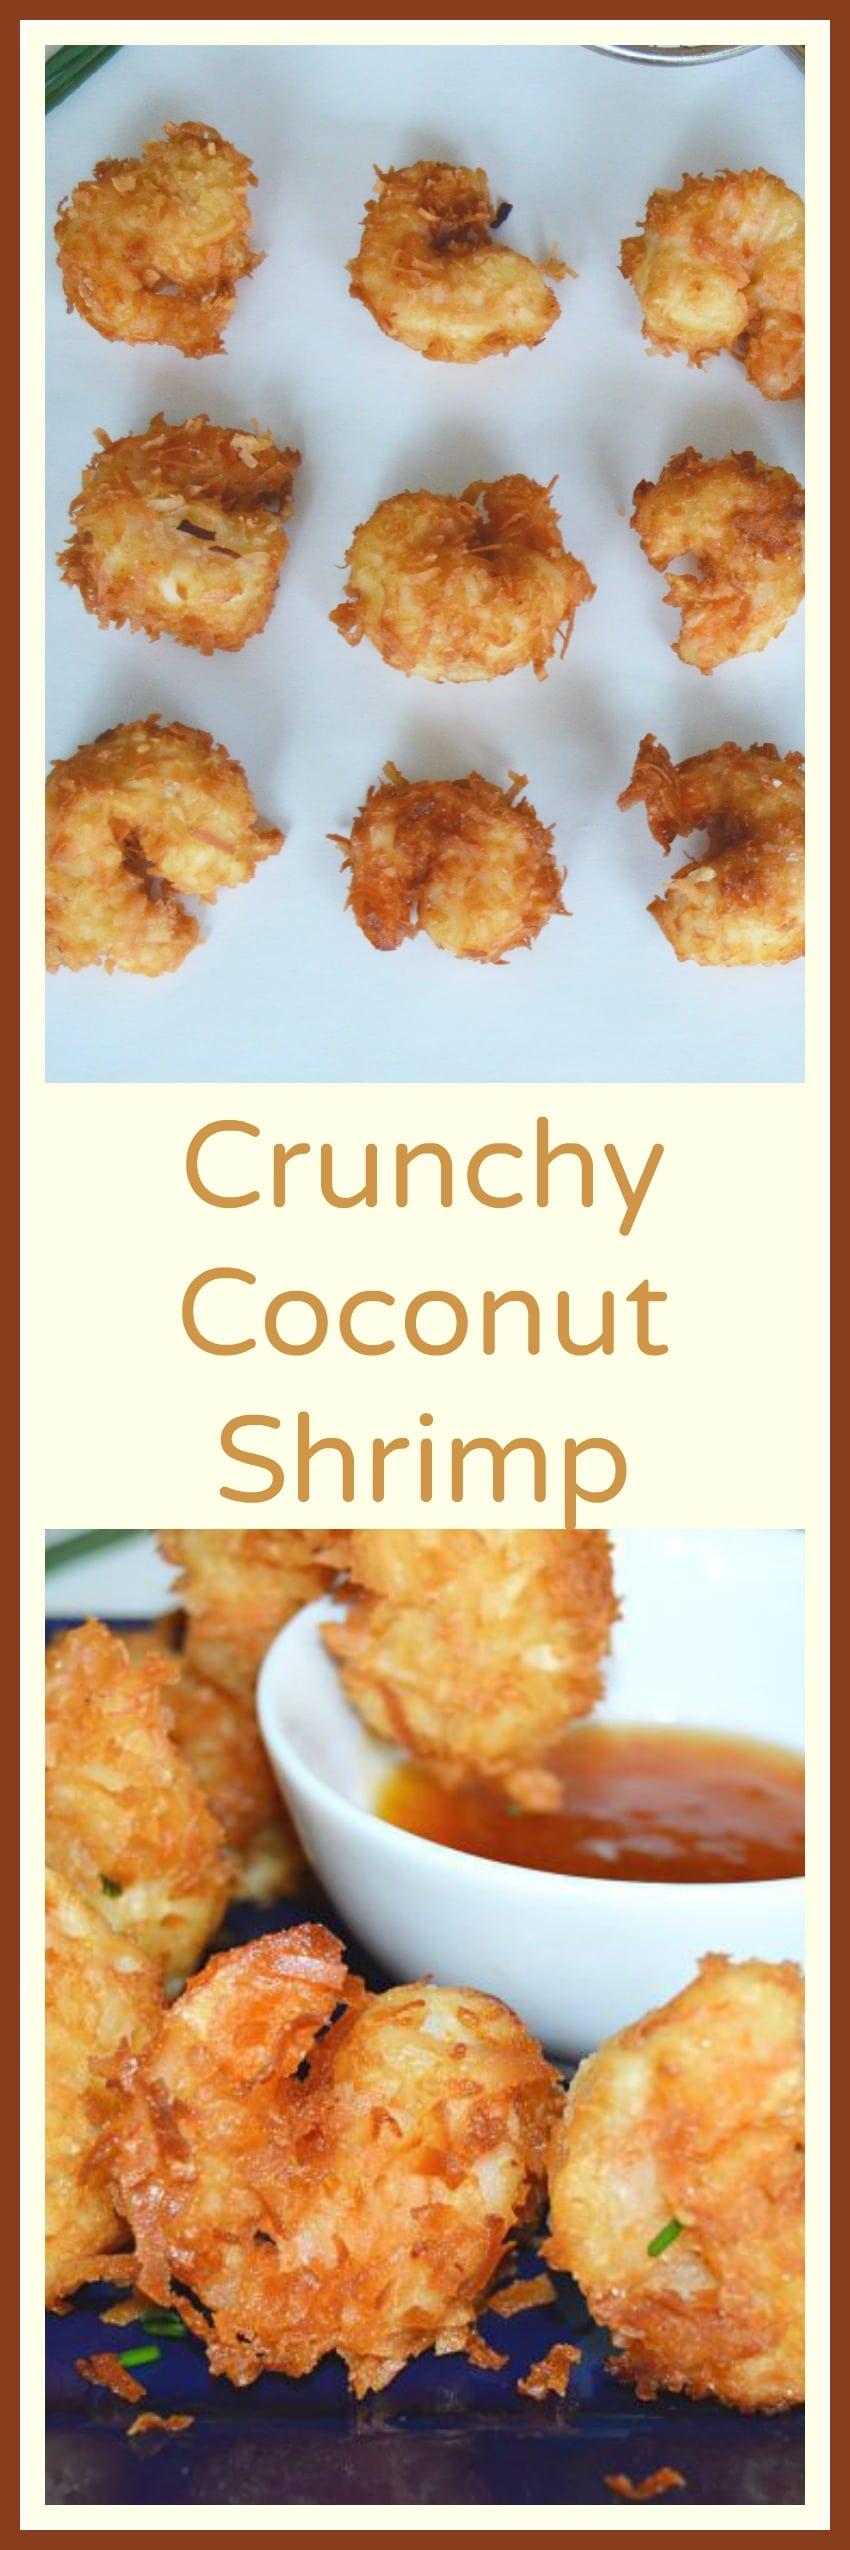 Simple Coconut Shrimp-Crunchy, Juicy and Delicious! - West ...